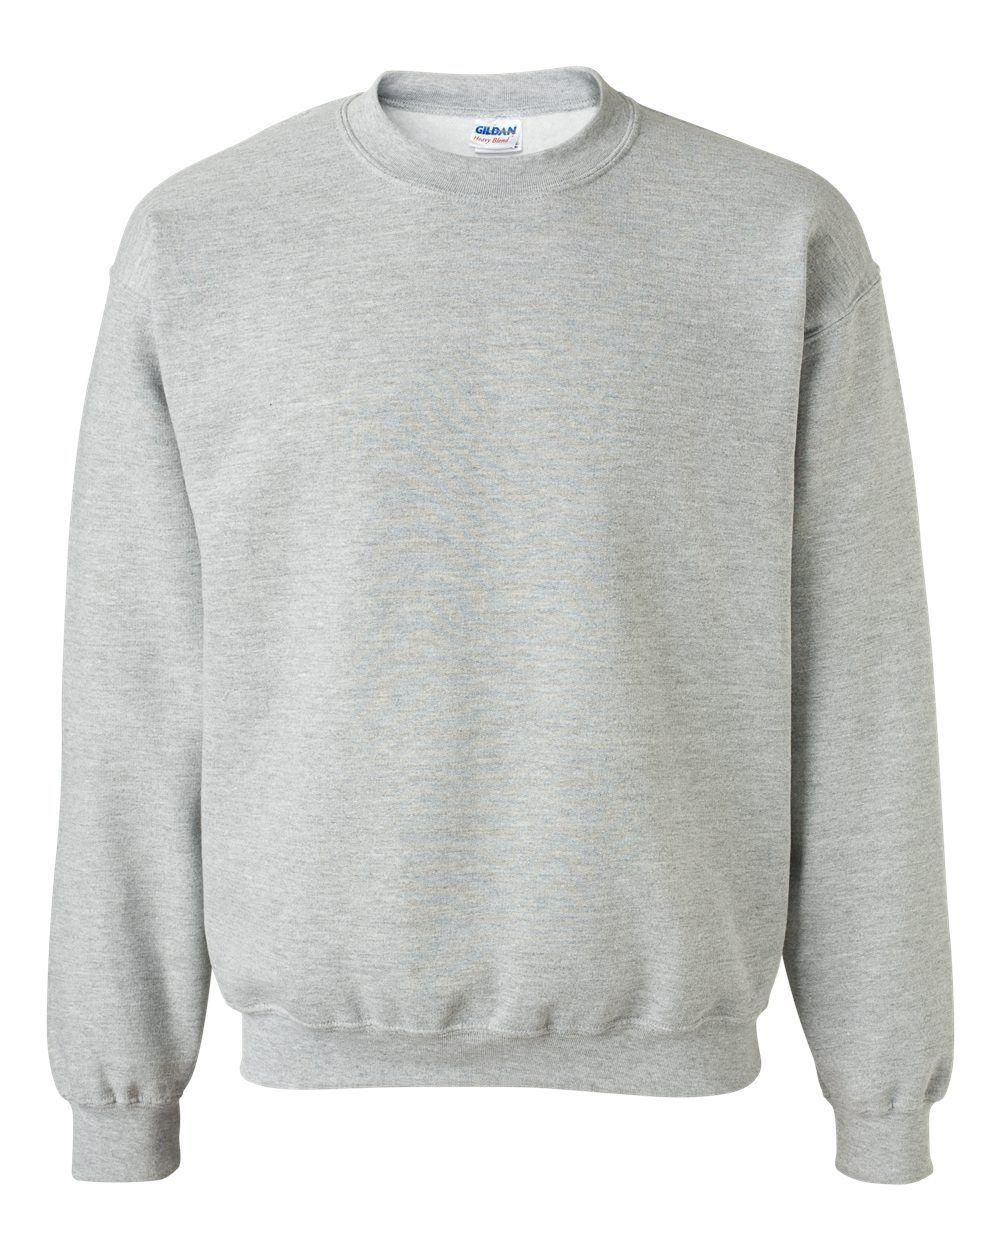 Gildan hoodie dark grey item 18000 mens fashion pinterest gildan hoodie dark grey item 18000 nvjuhfo Images